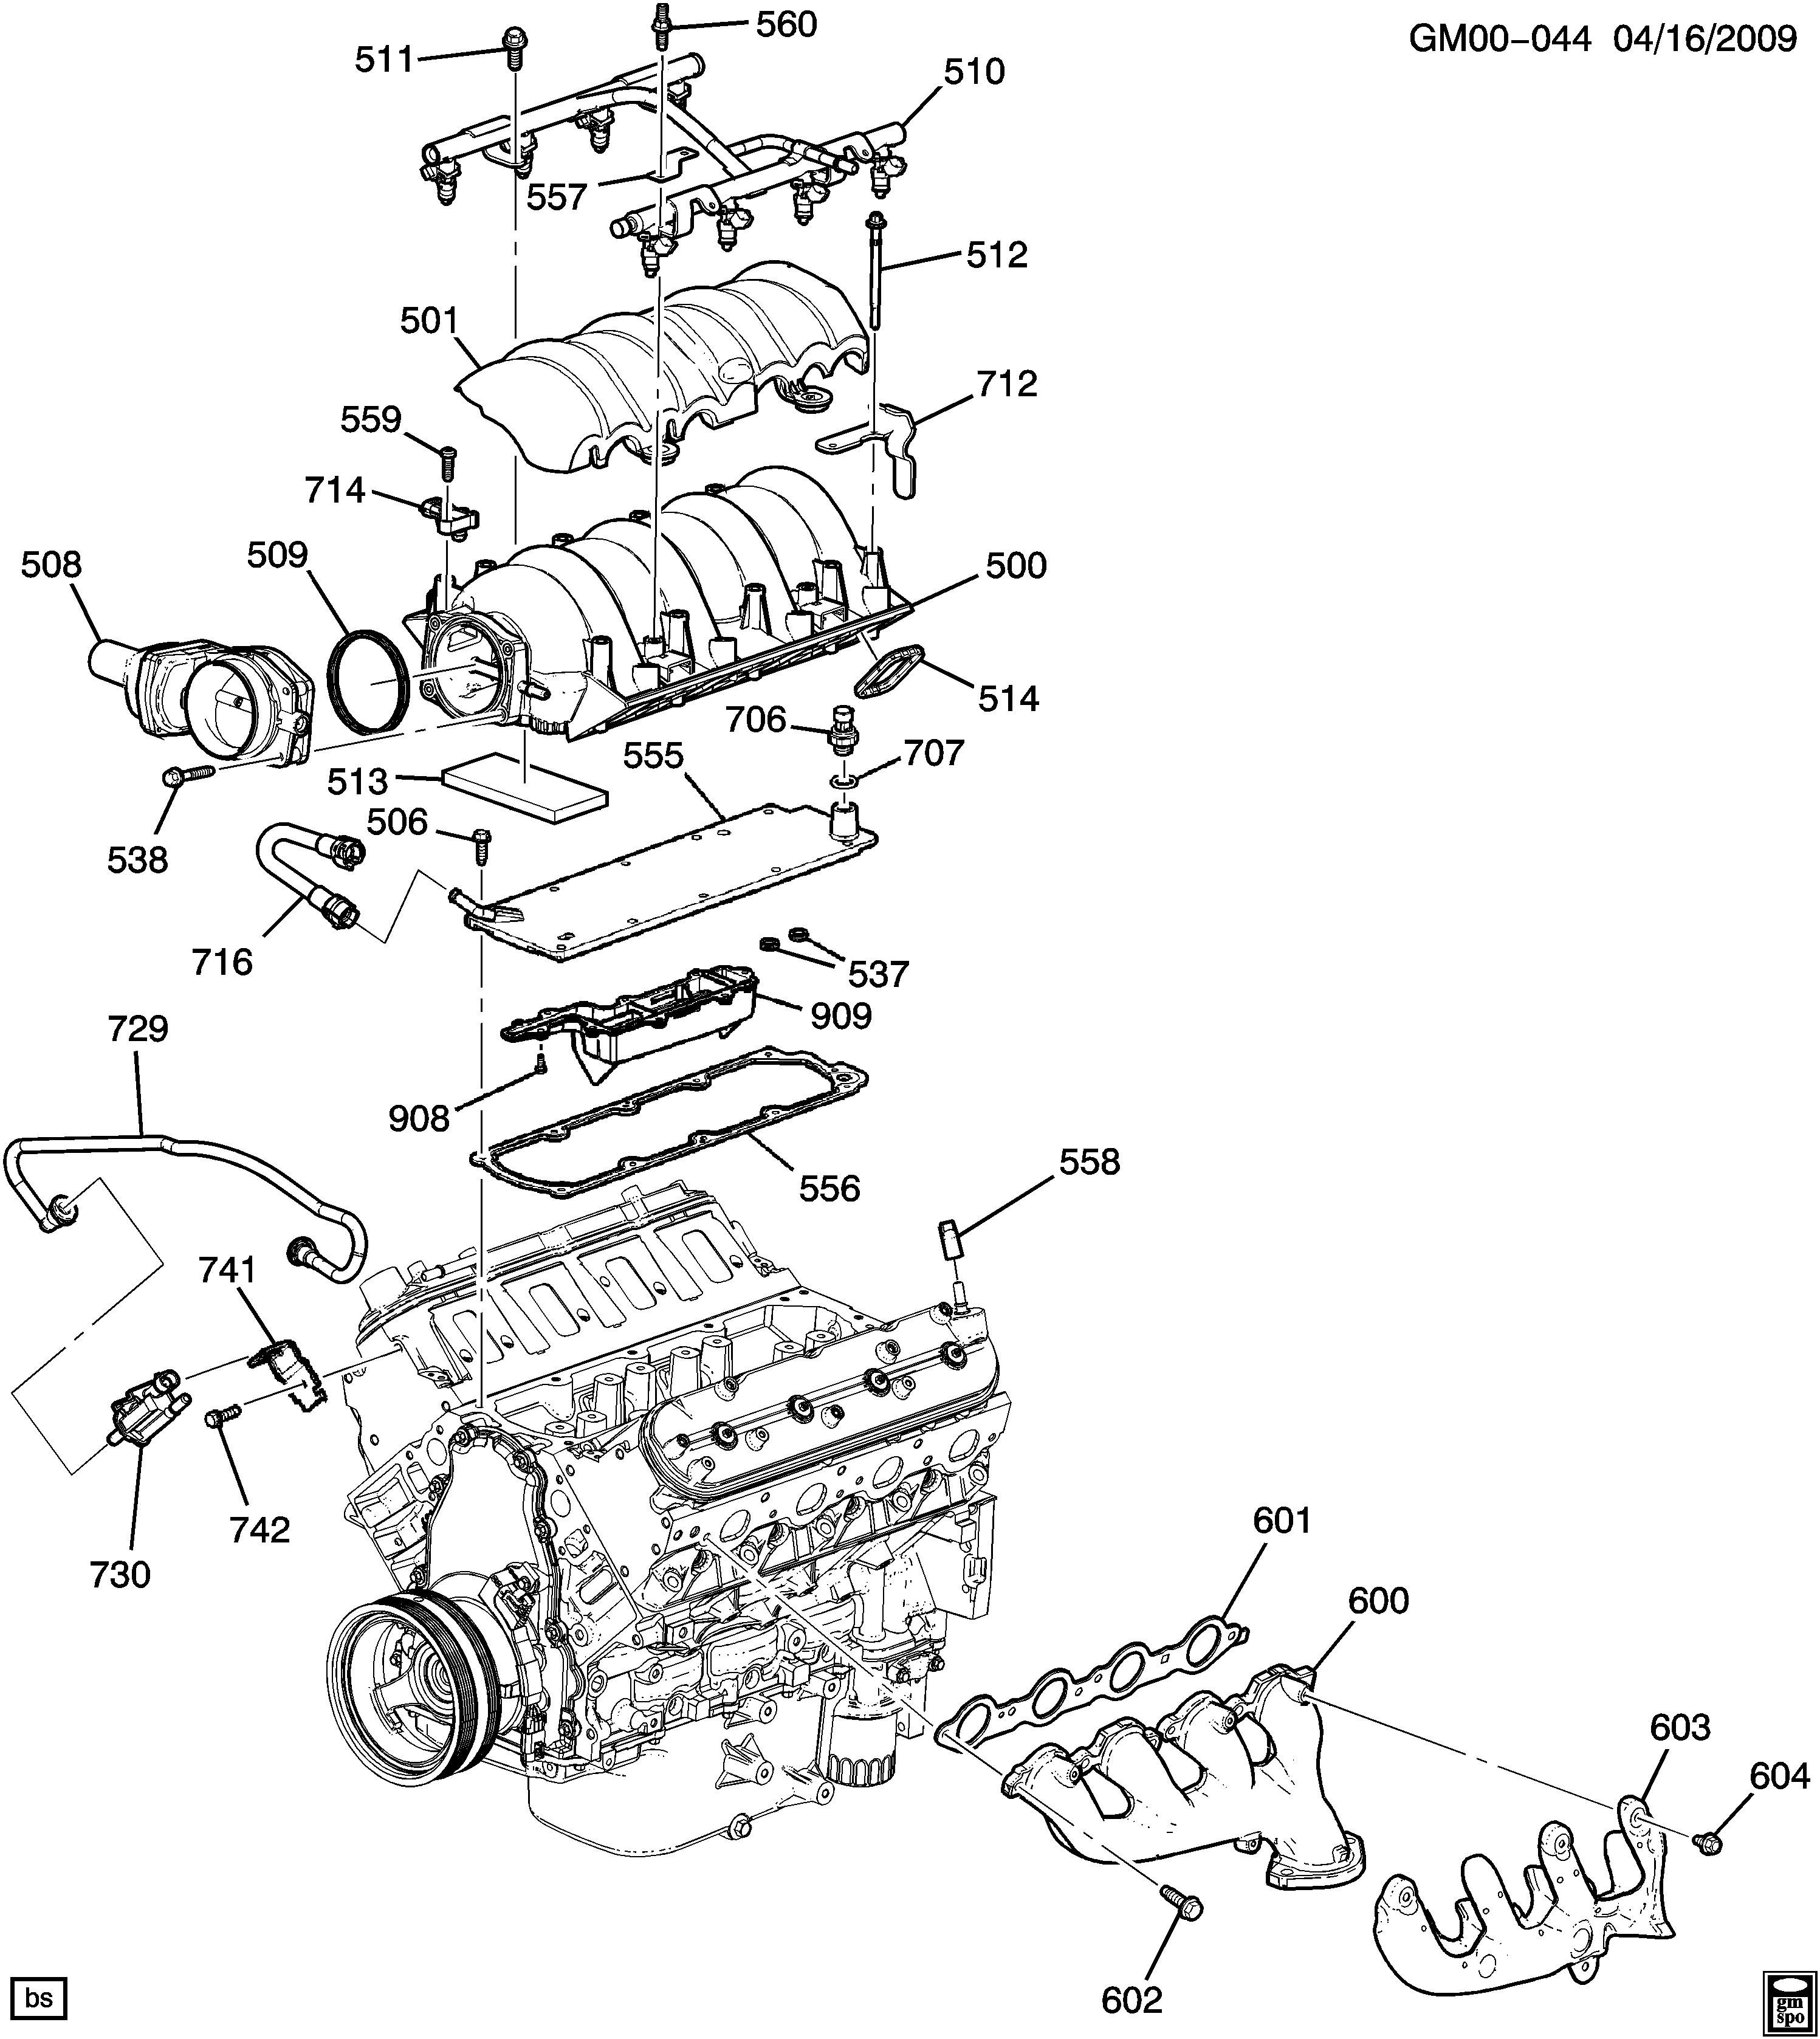 Camaro Convertible - Engine asm-6.2l v8 part 5 manifolds & related parts >  Chevrolet EPC Online > Nemiga.com | Chevrolet L99 Engine Diagram |  | Parts catalogs